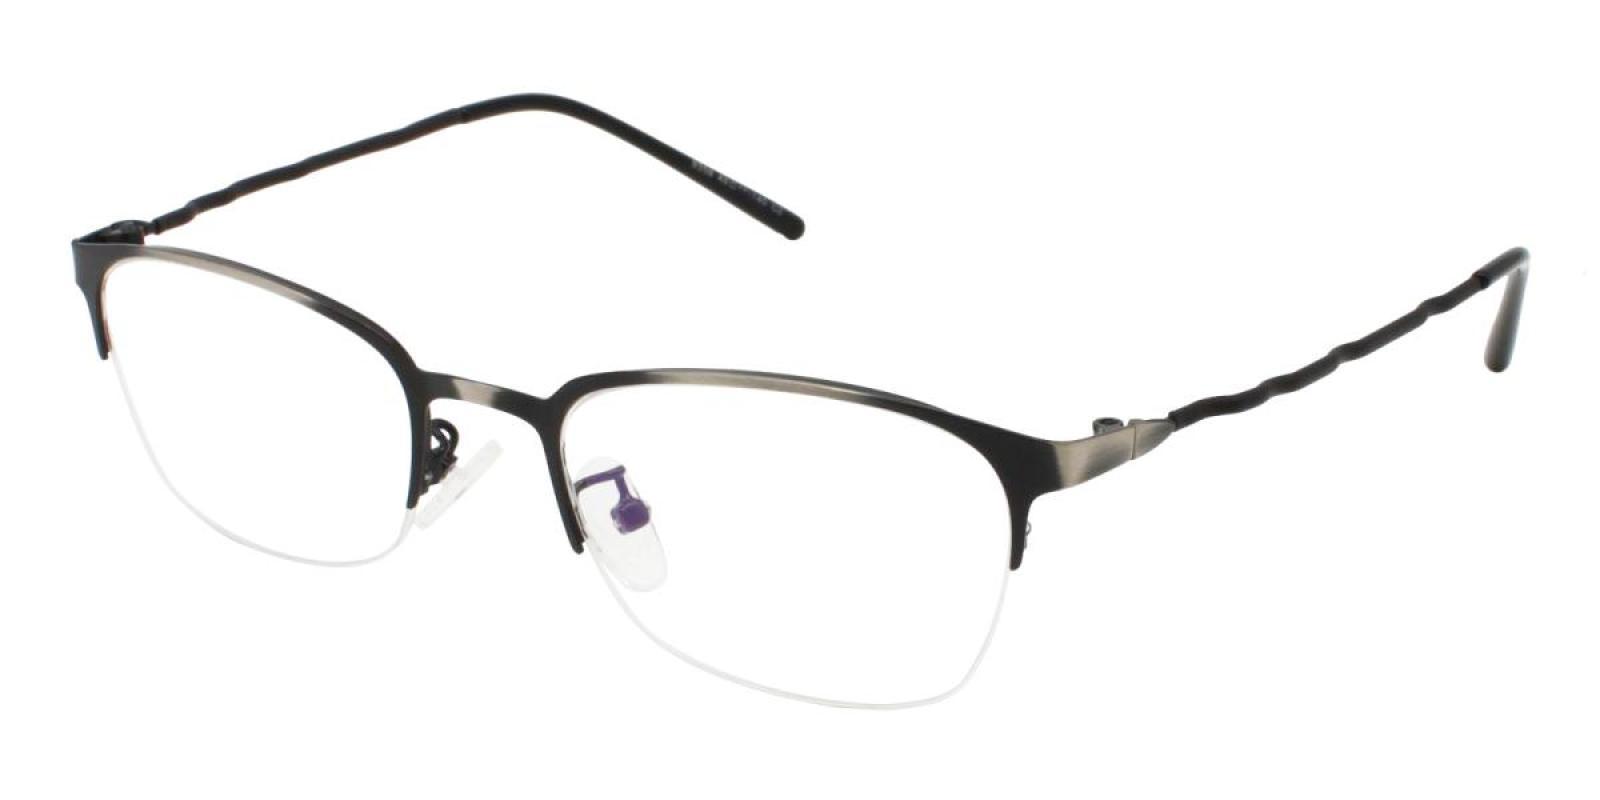 Wavain-Gun-Rectangle-Metal-Eyeglasses-additional1